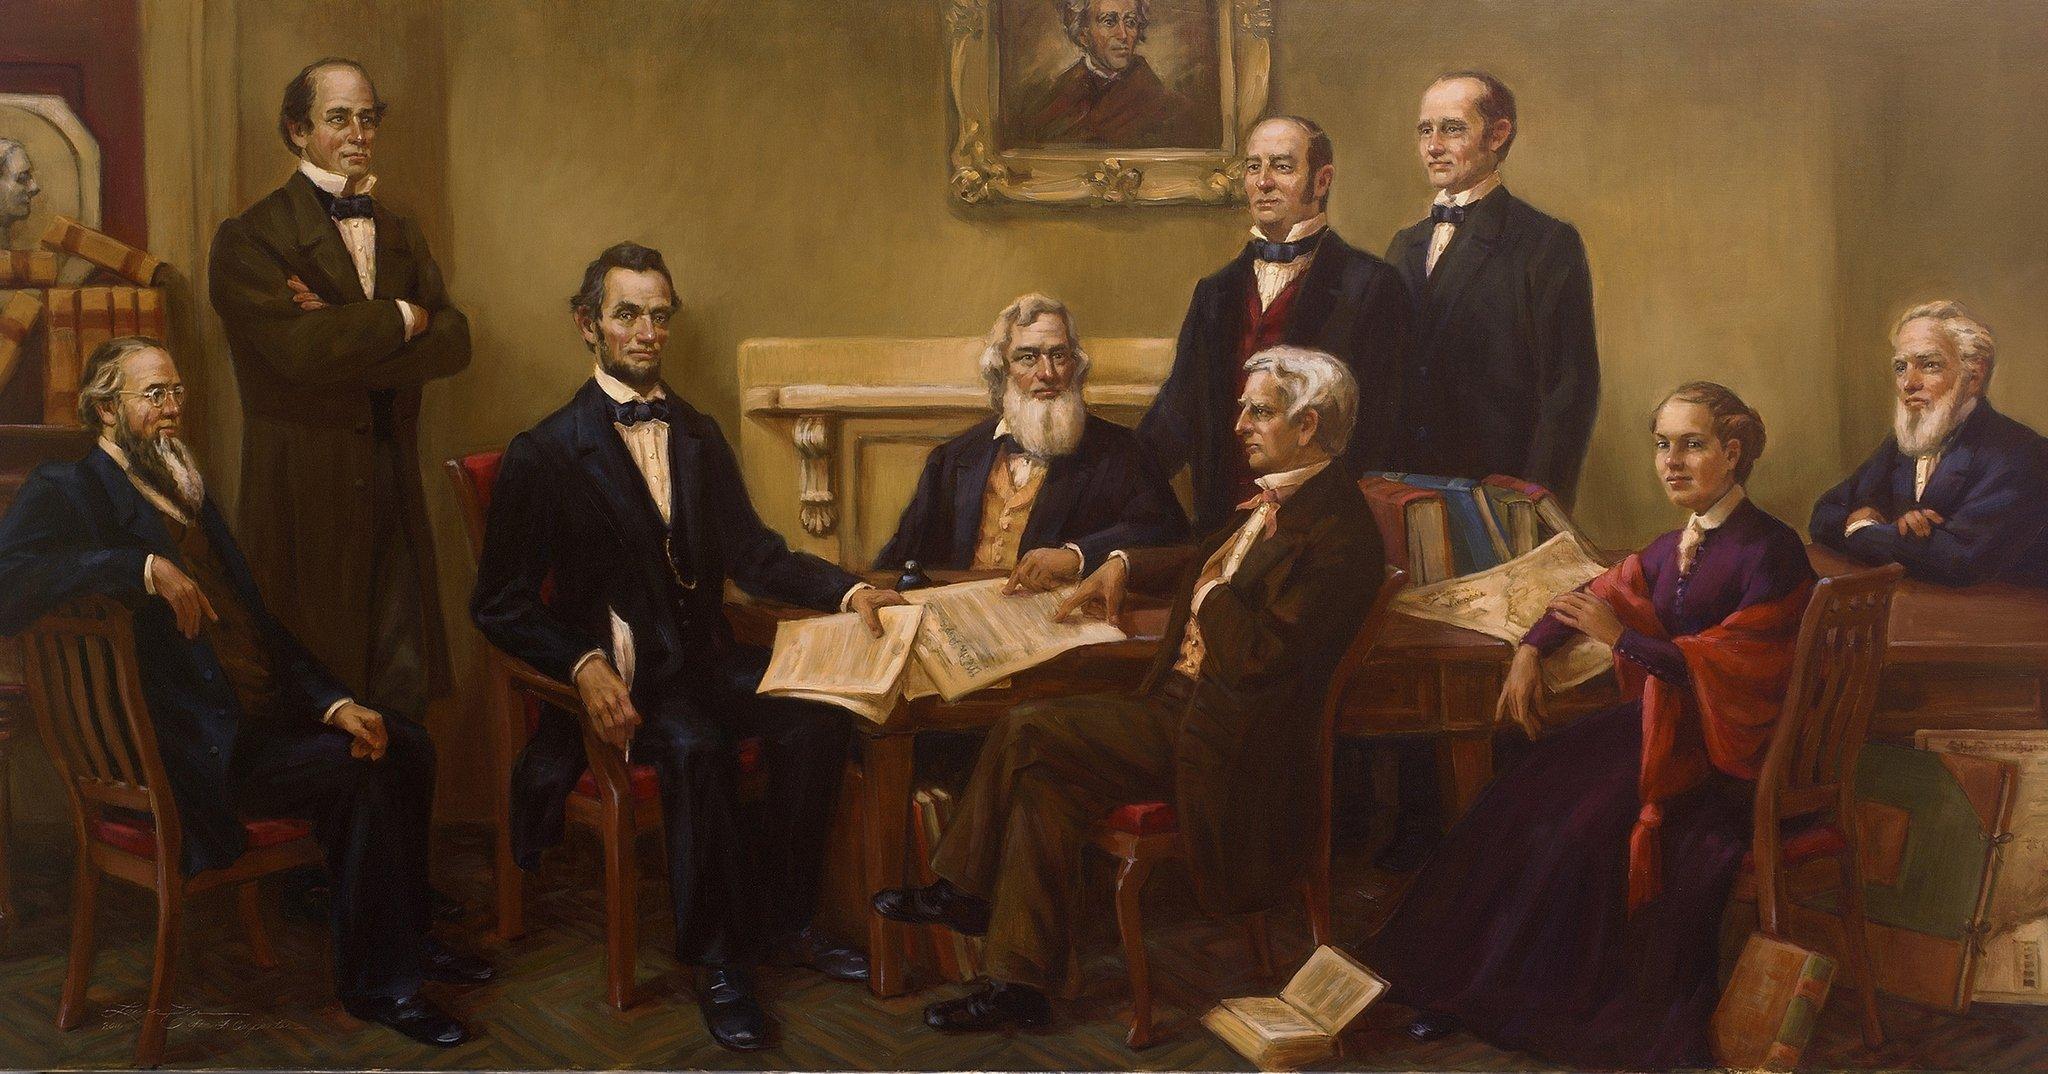 emancipation-proclamation-paintingjpg-2a44ef622feb4229